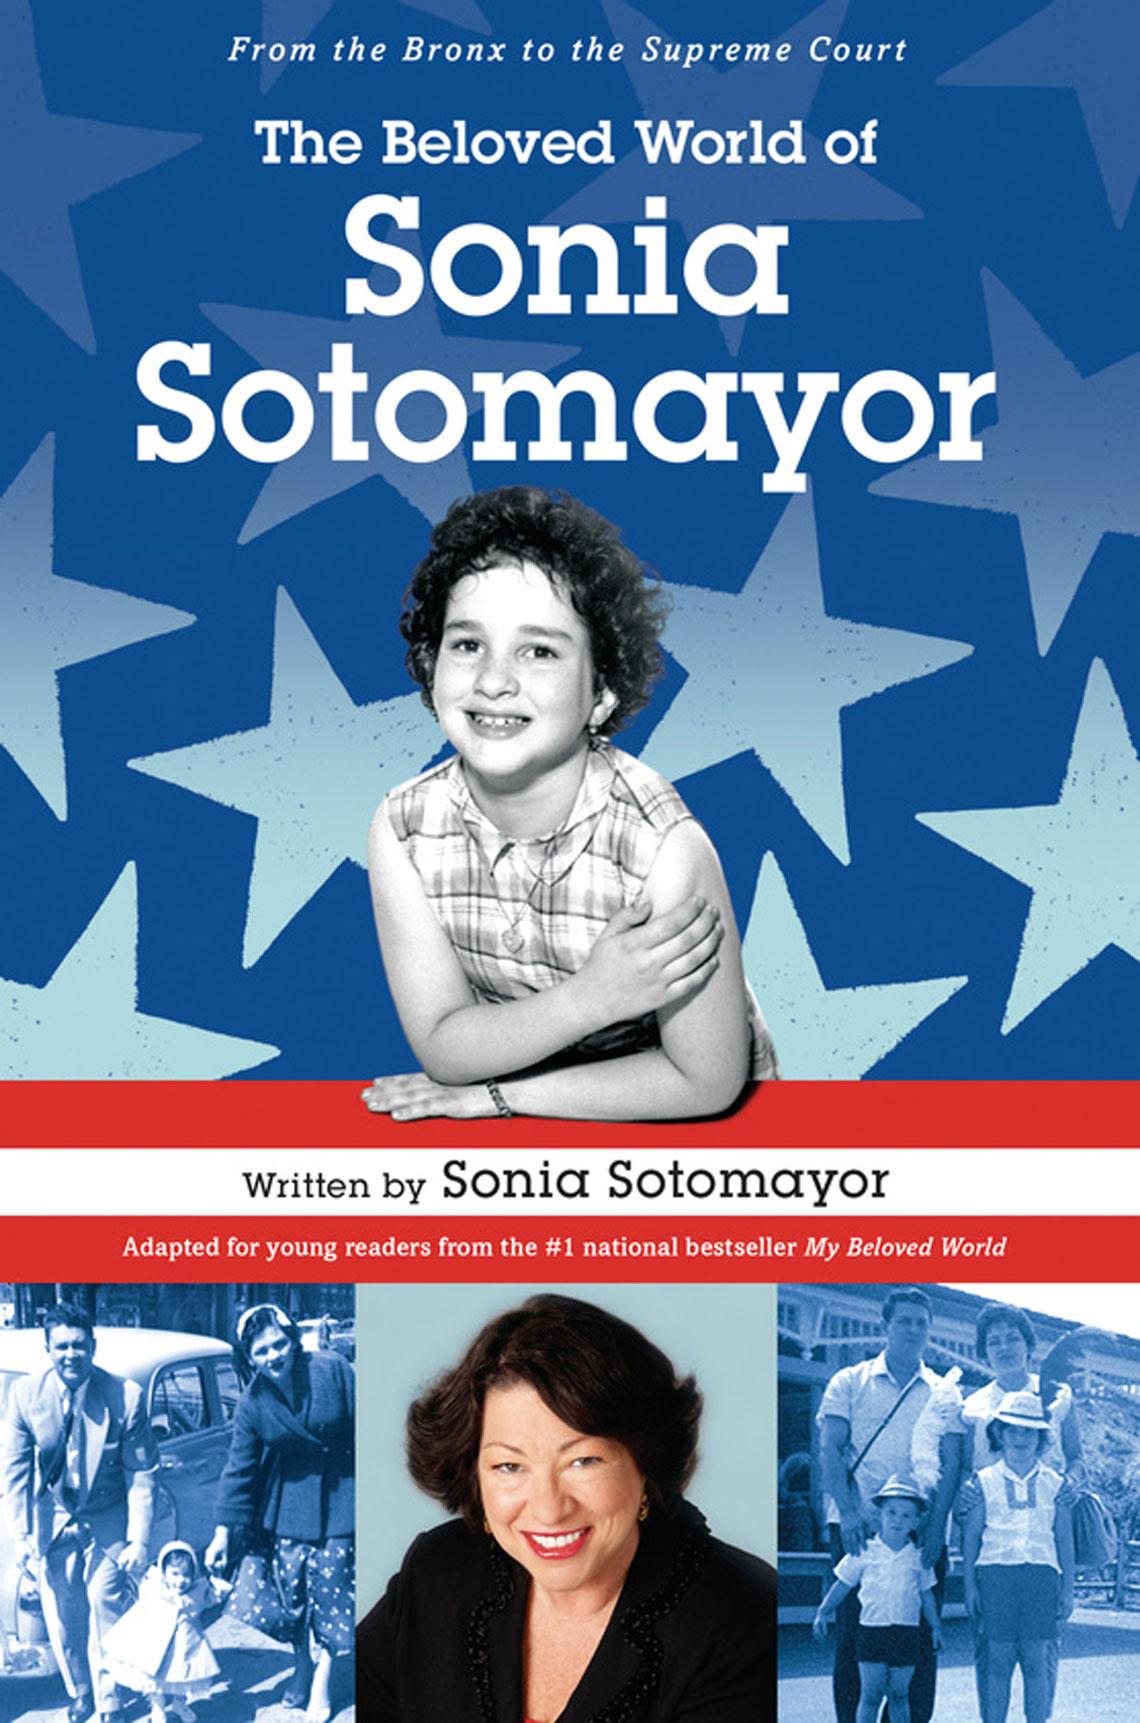 "Carátula del libro de Sonia Sotomayor ""The Beloved World of Sonia Sotomayor""."